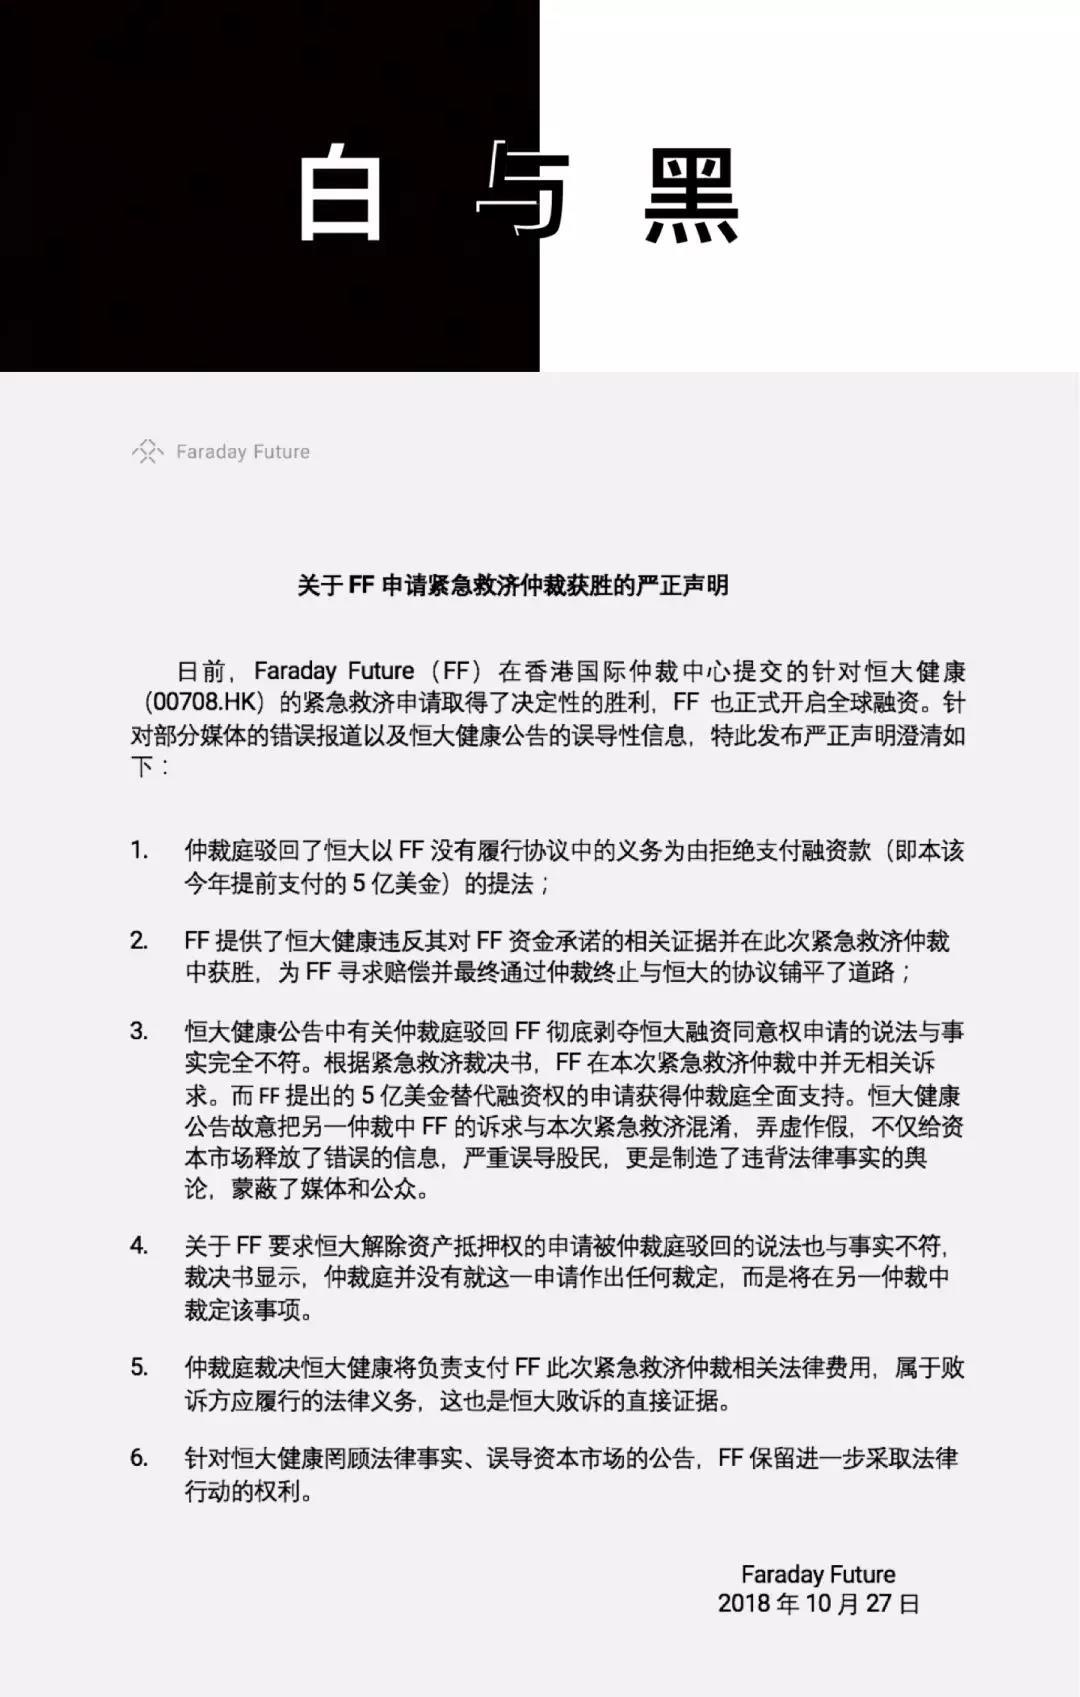 FF发布申请紧急救济仲裁声明:FF全面胜诉